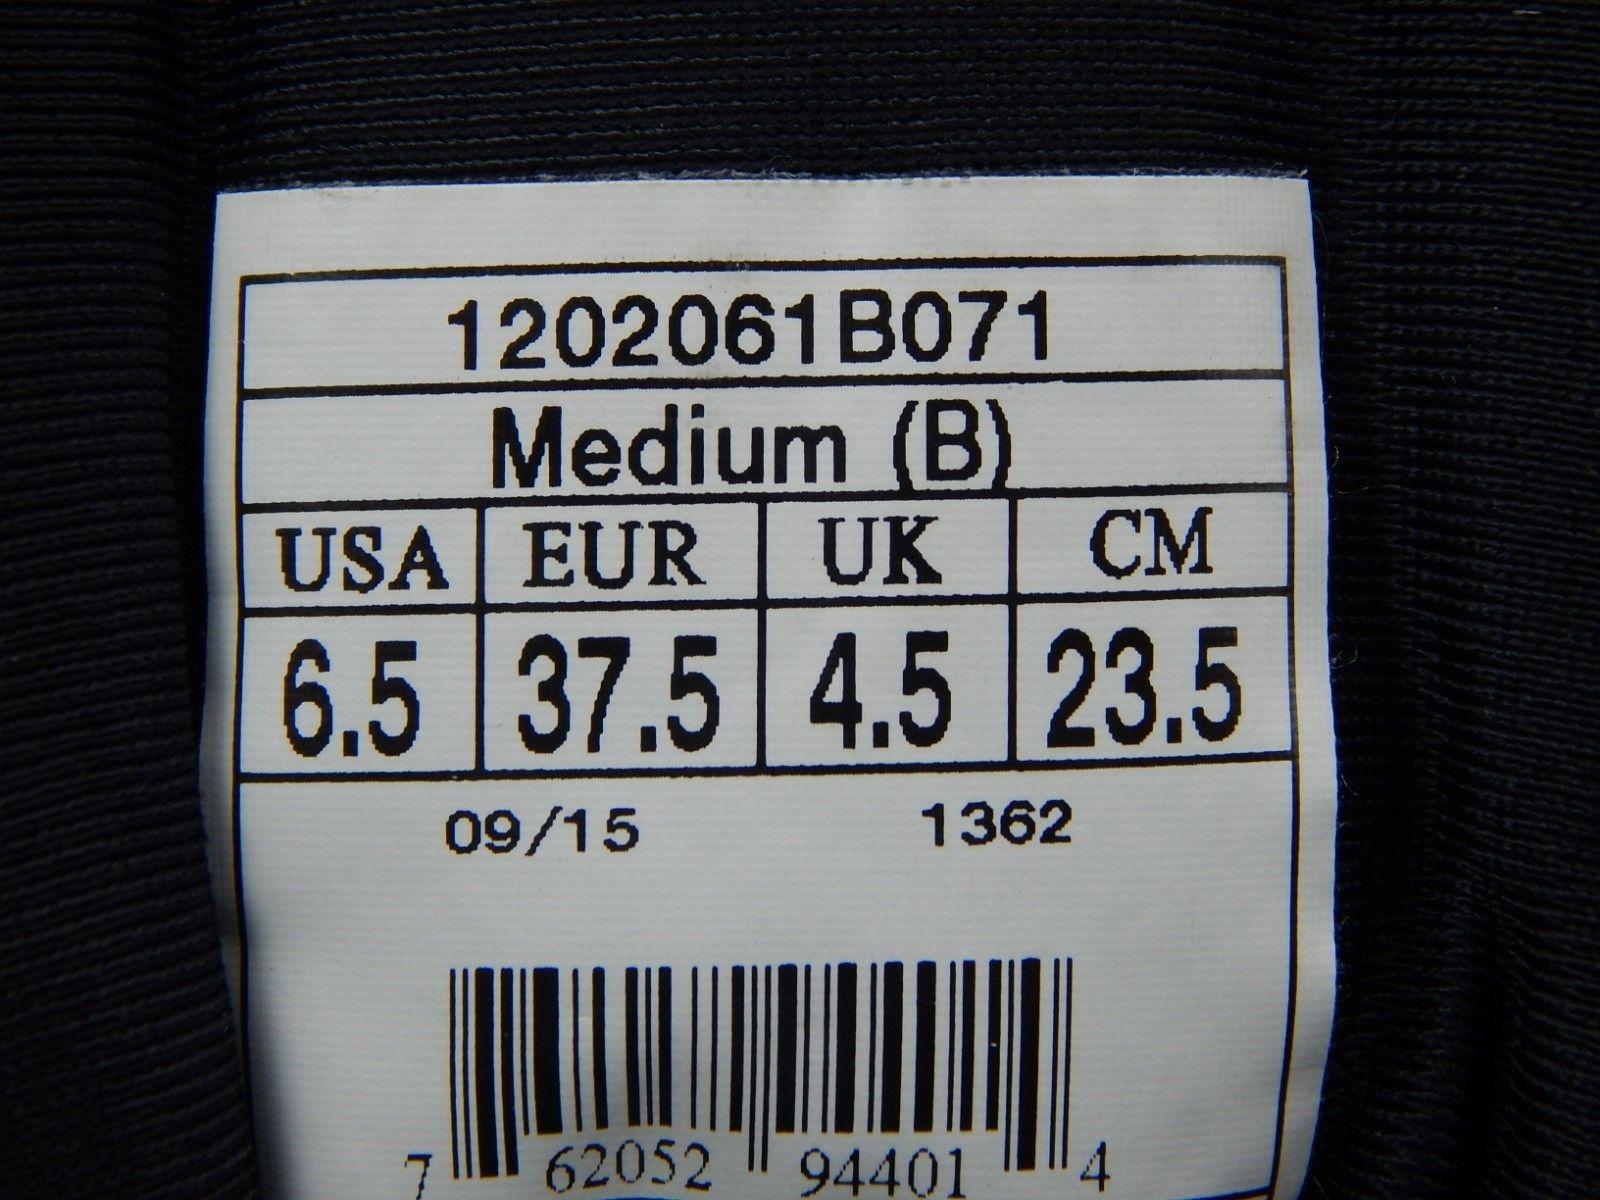 Brooks Launch 3 Size 6.5 M (B) EU 37.5 Women's Running Shoes Black 1202061B071 image 11